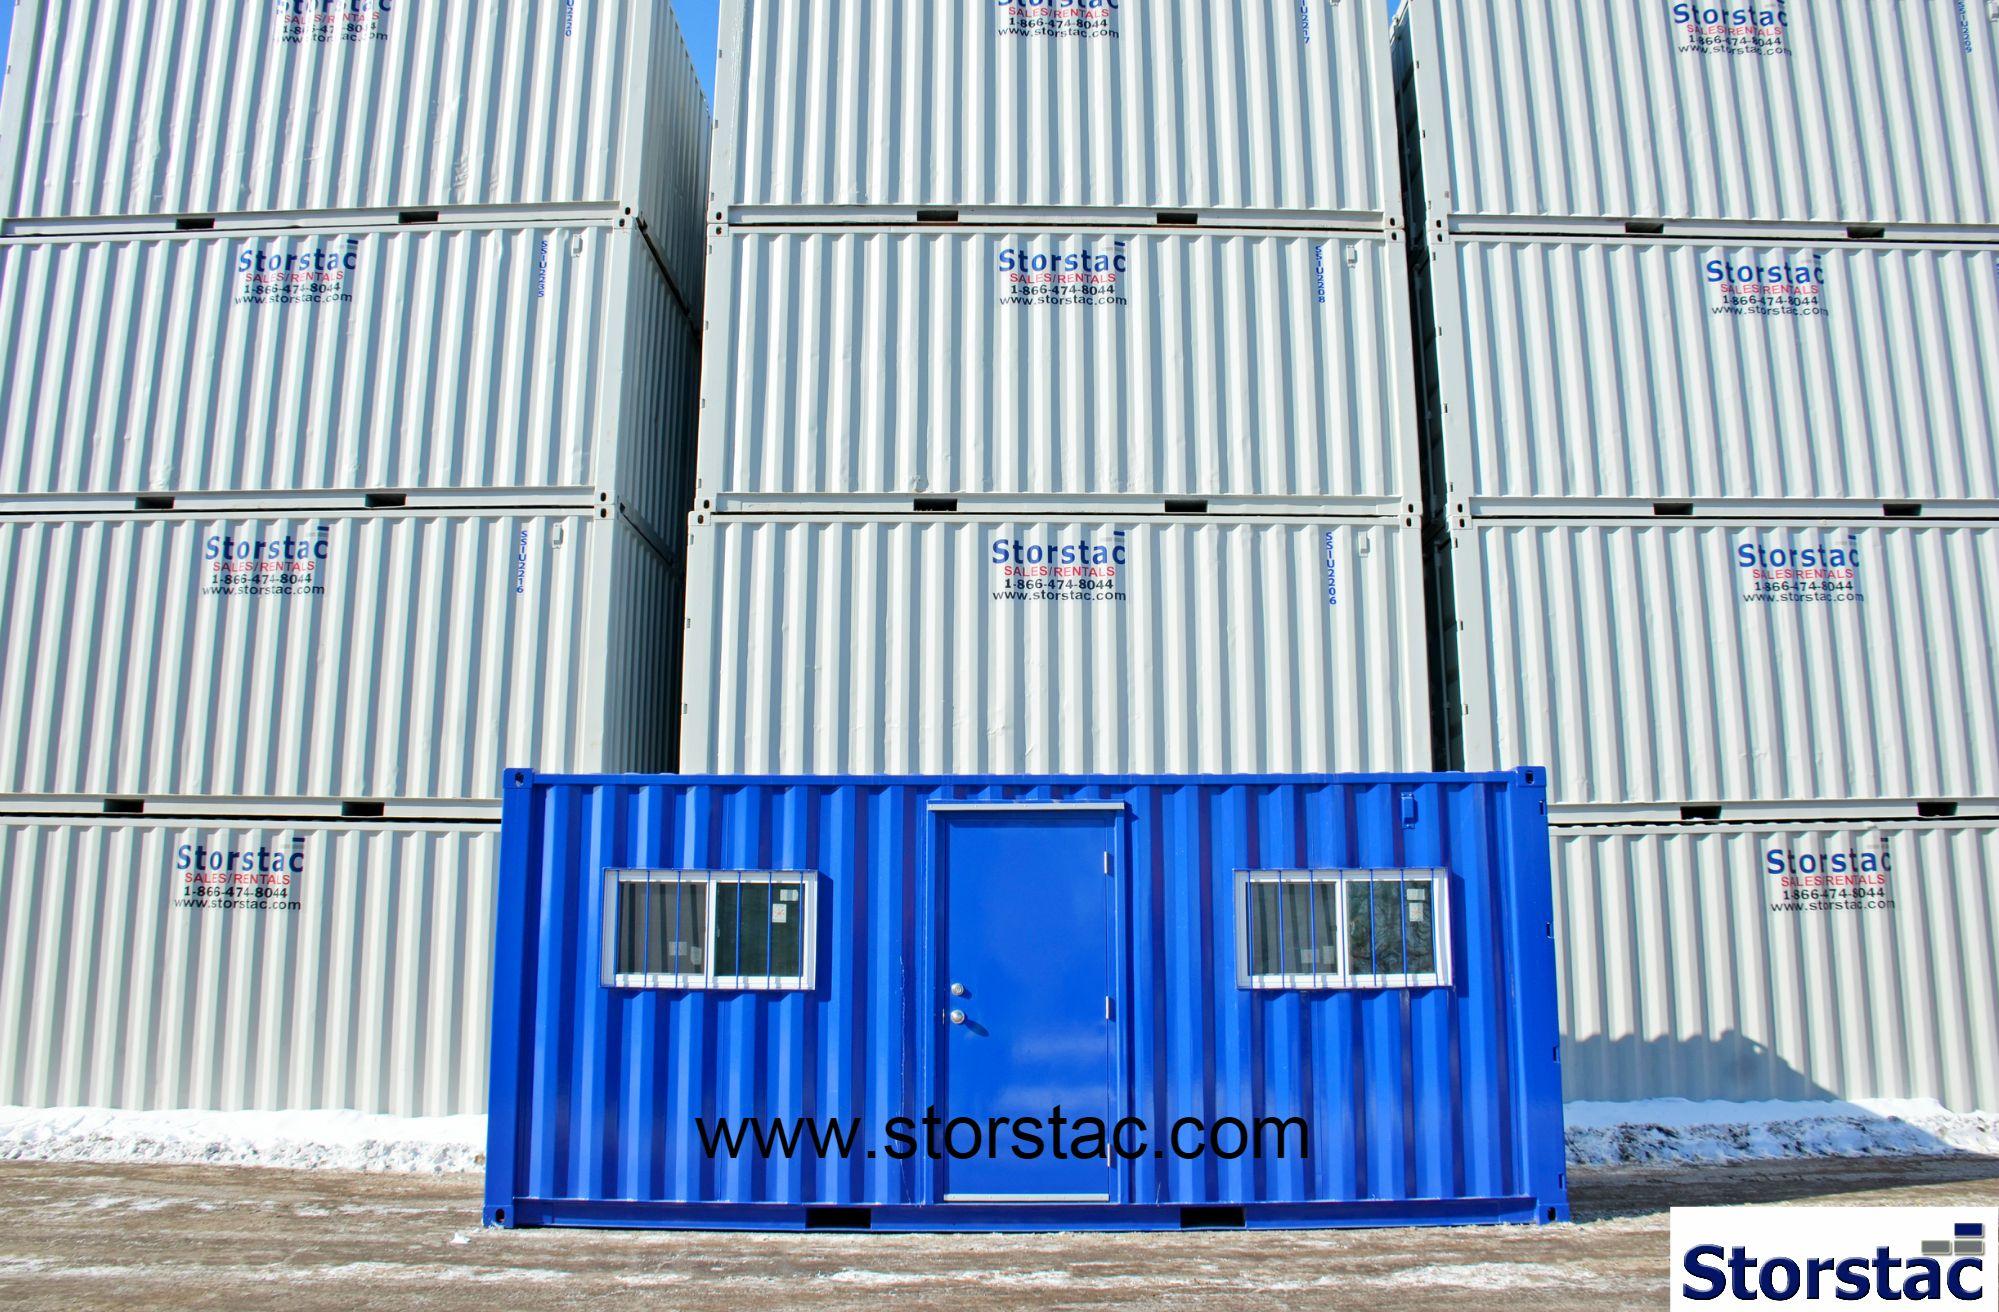 air conditioner container dayton drum switch wiring diagram conditioned storage containers dandk organizer